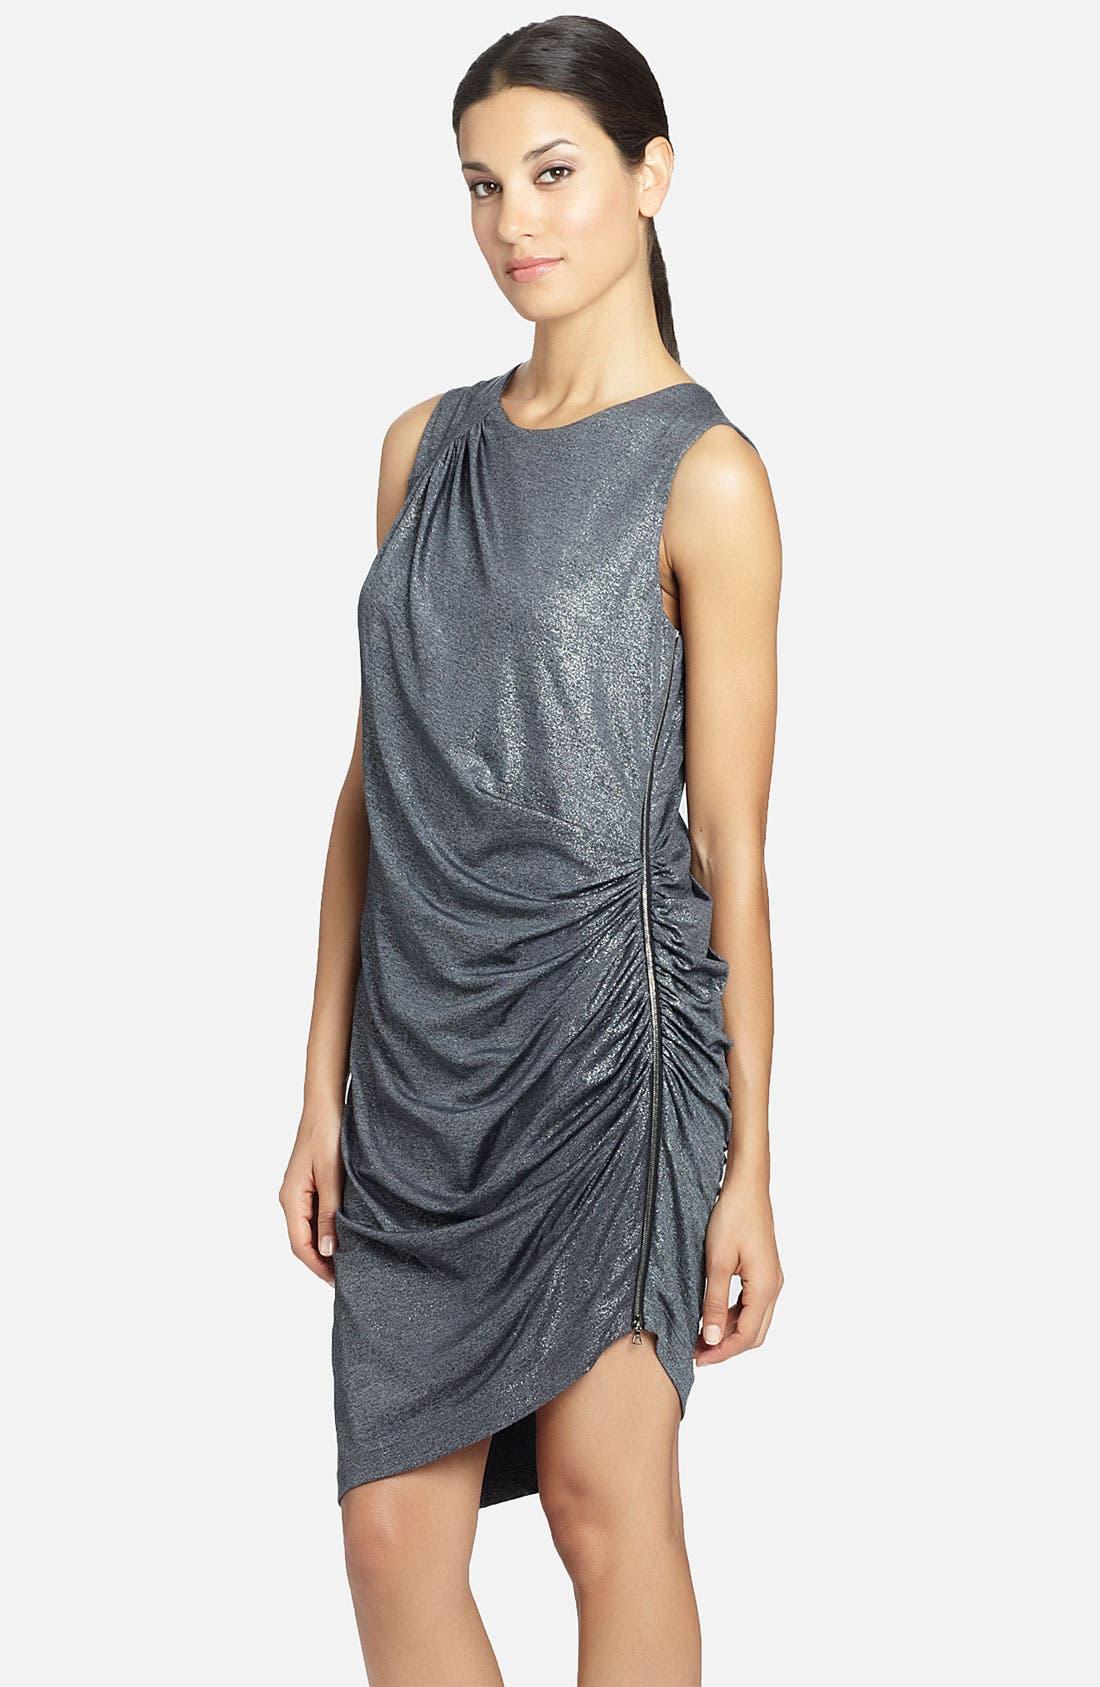 Main Image - Cynthia Steffe 'Rianna' Side Zip Metallic Dress